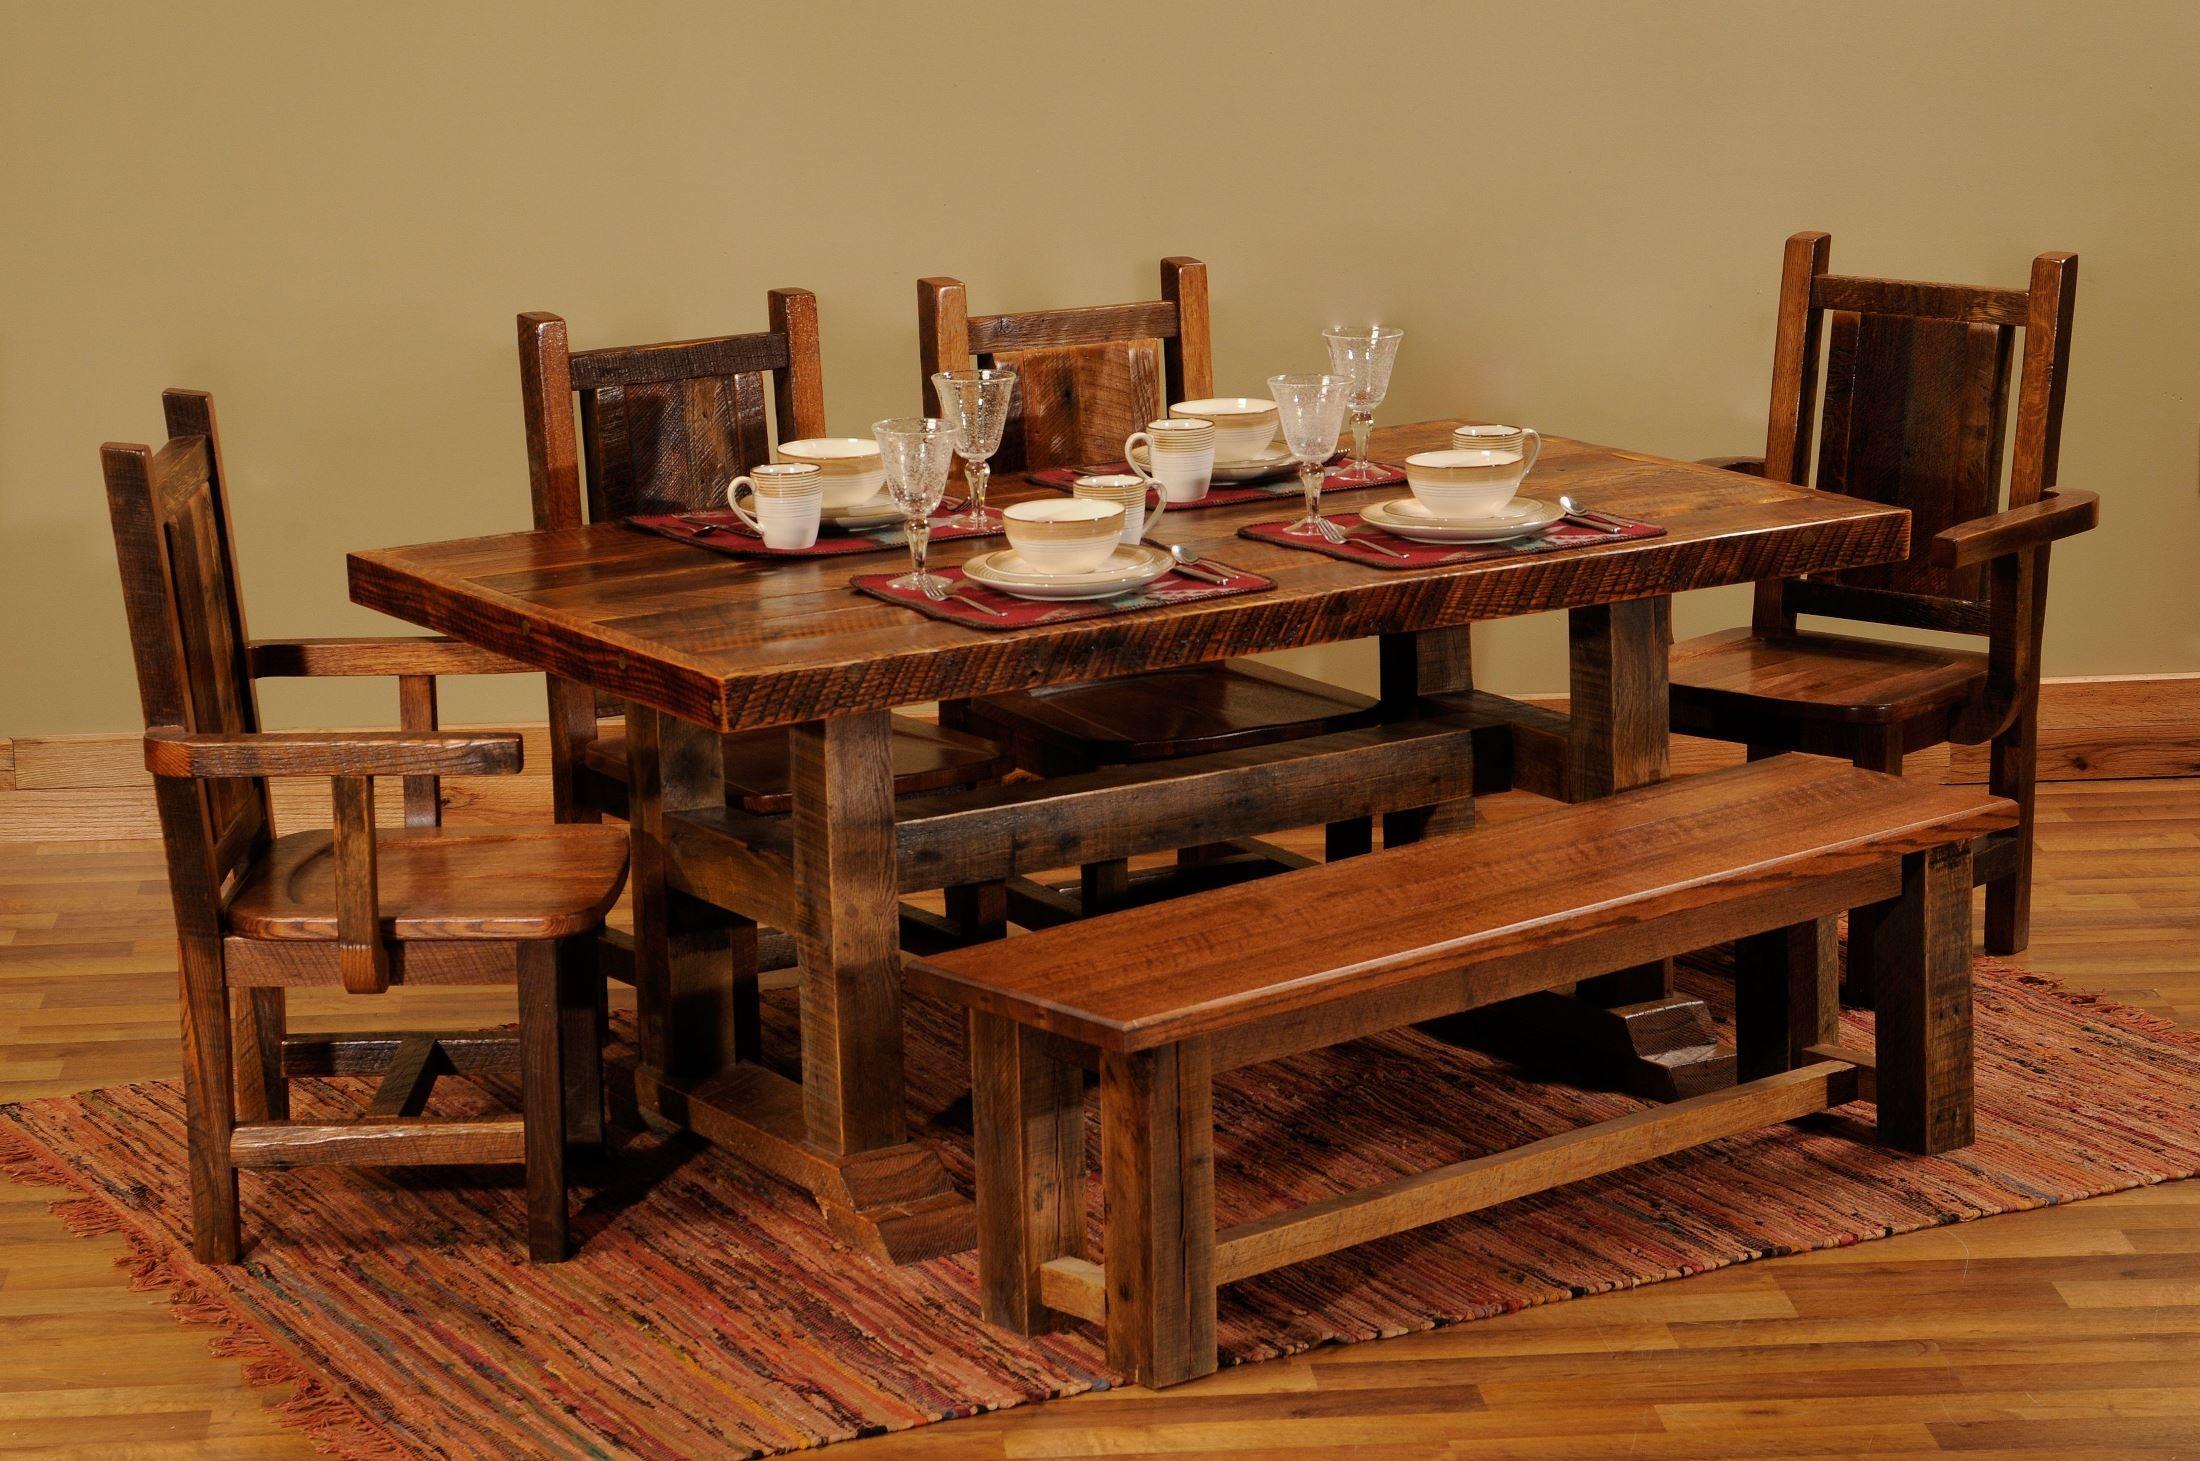 Barnwood Contoured Wood Seat Artisan Antique Oak Dining